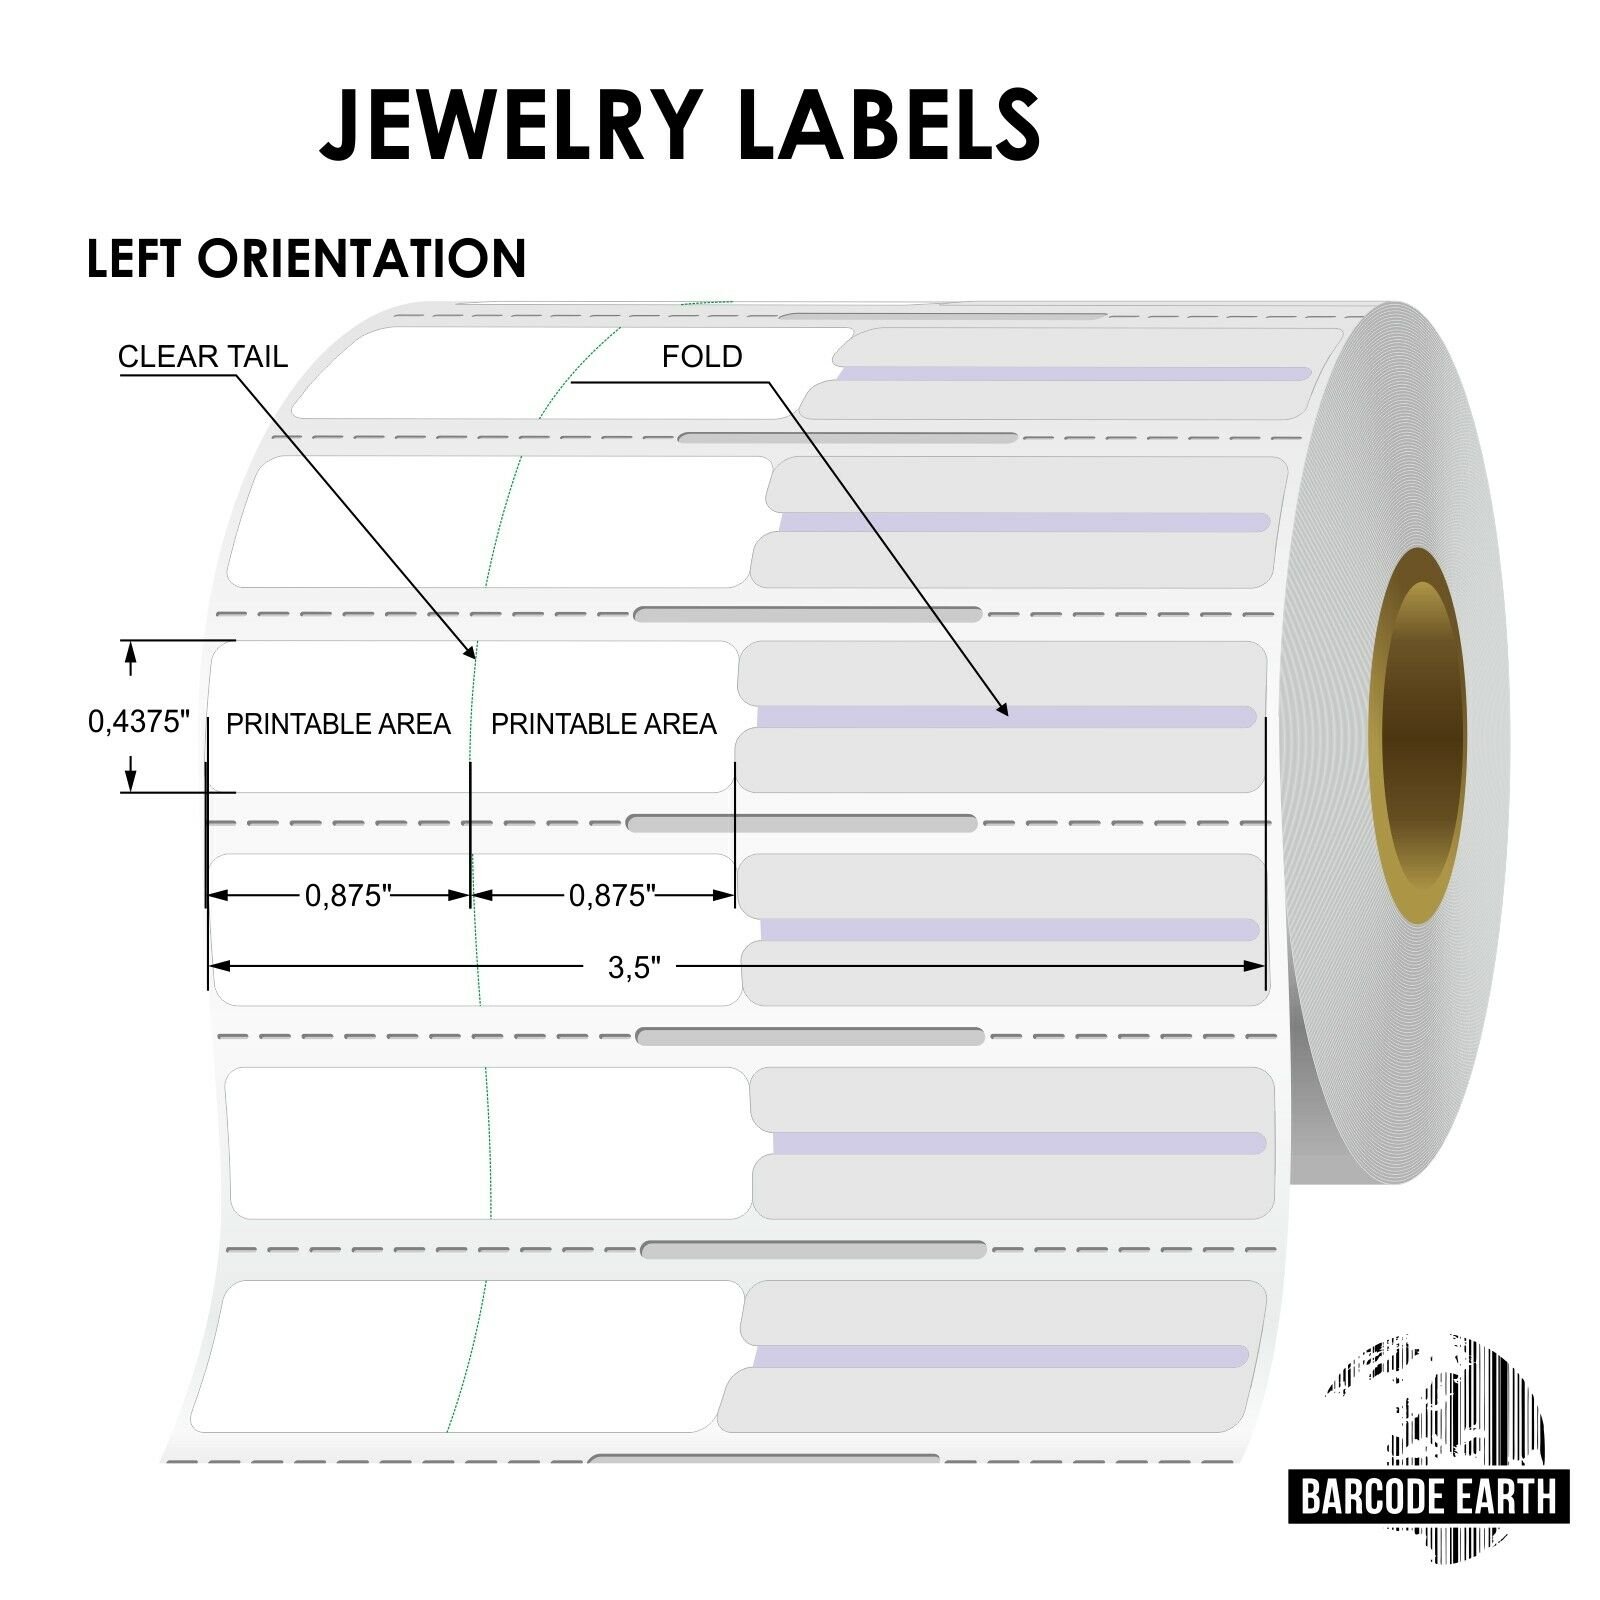 Thermal Transfer Jewelry Rat Tail Labels for Zebra Thermal Printer